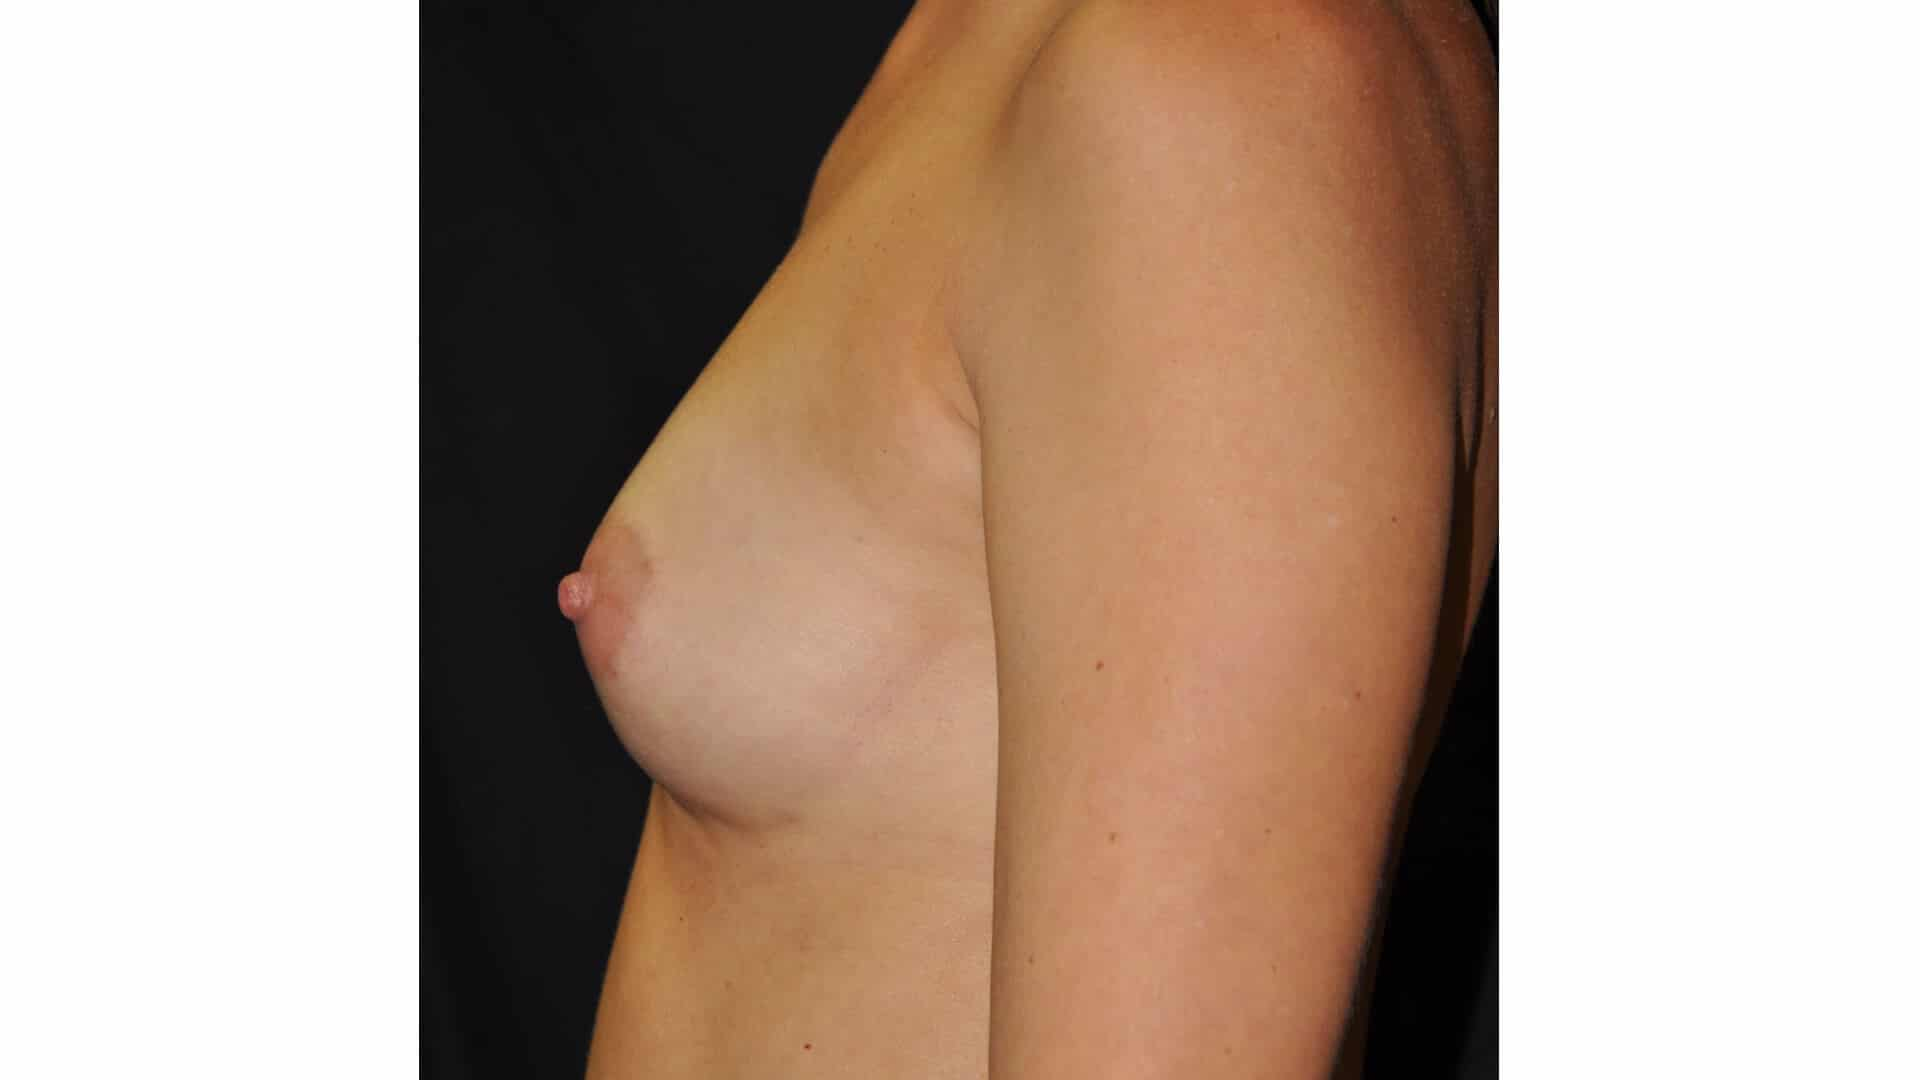 BREAST AUGMENTATION – CASE #35676